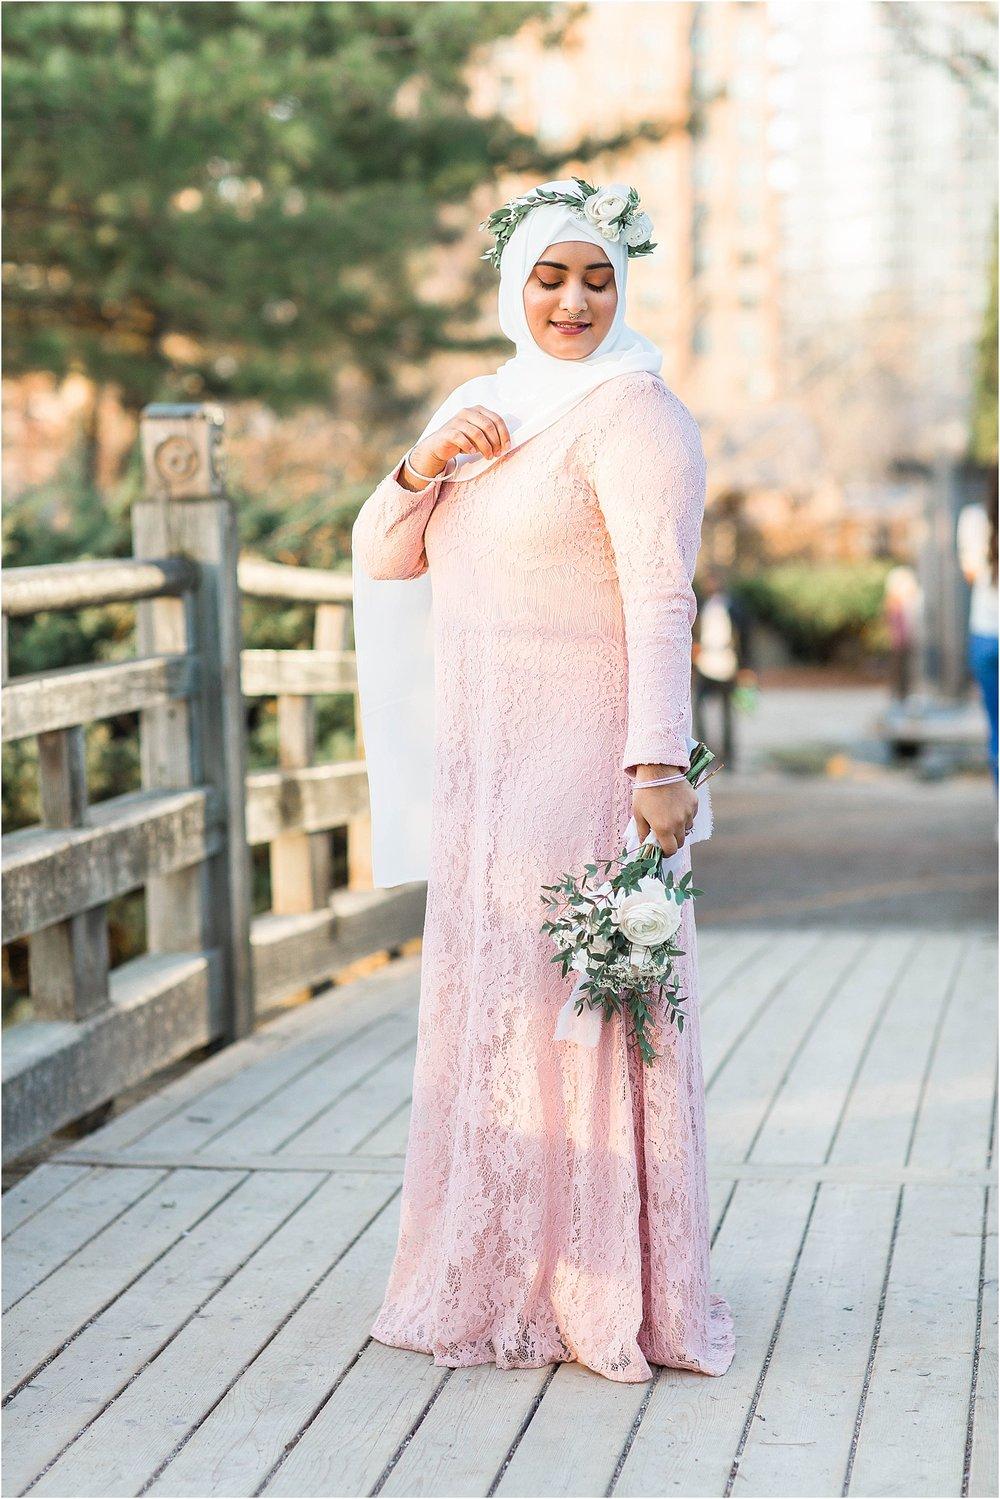 Kariya-Park-Anniversary-Session-Toronto-Mississauga-Brampton-Scarborough-GTA-Pakistani-Indian-Wedding-Engagement-Photographer-Photography_0021.jpg